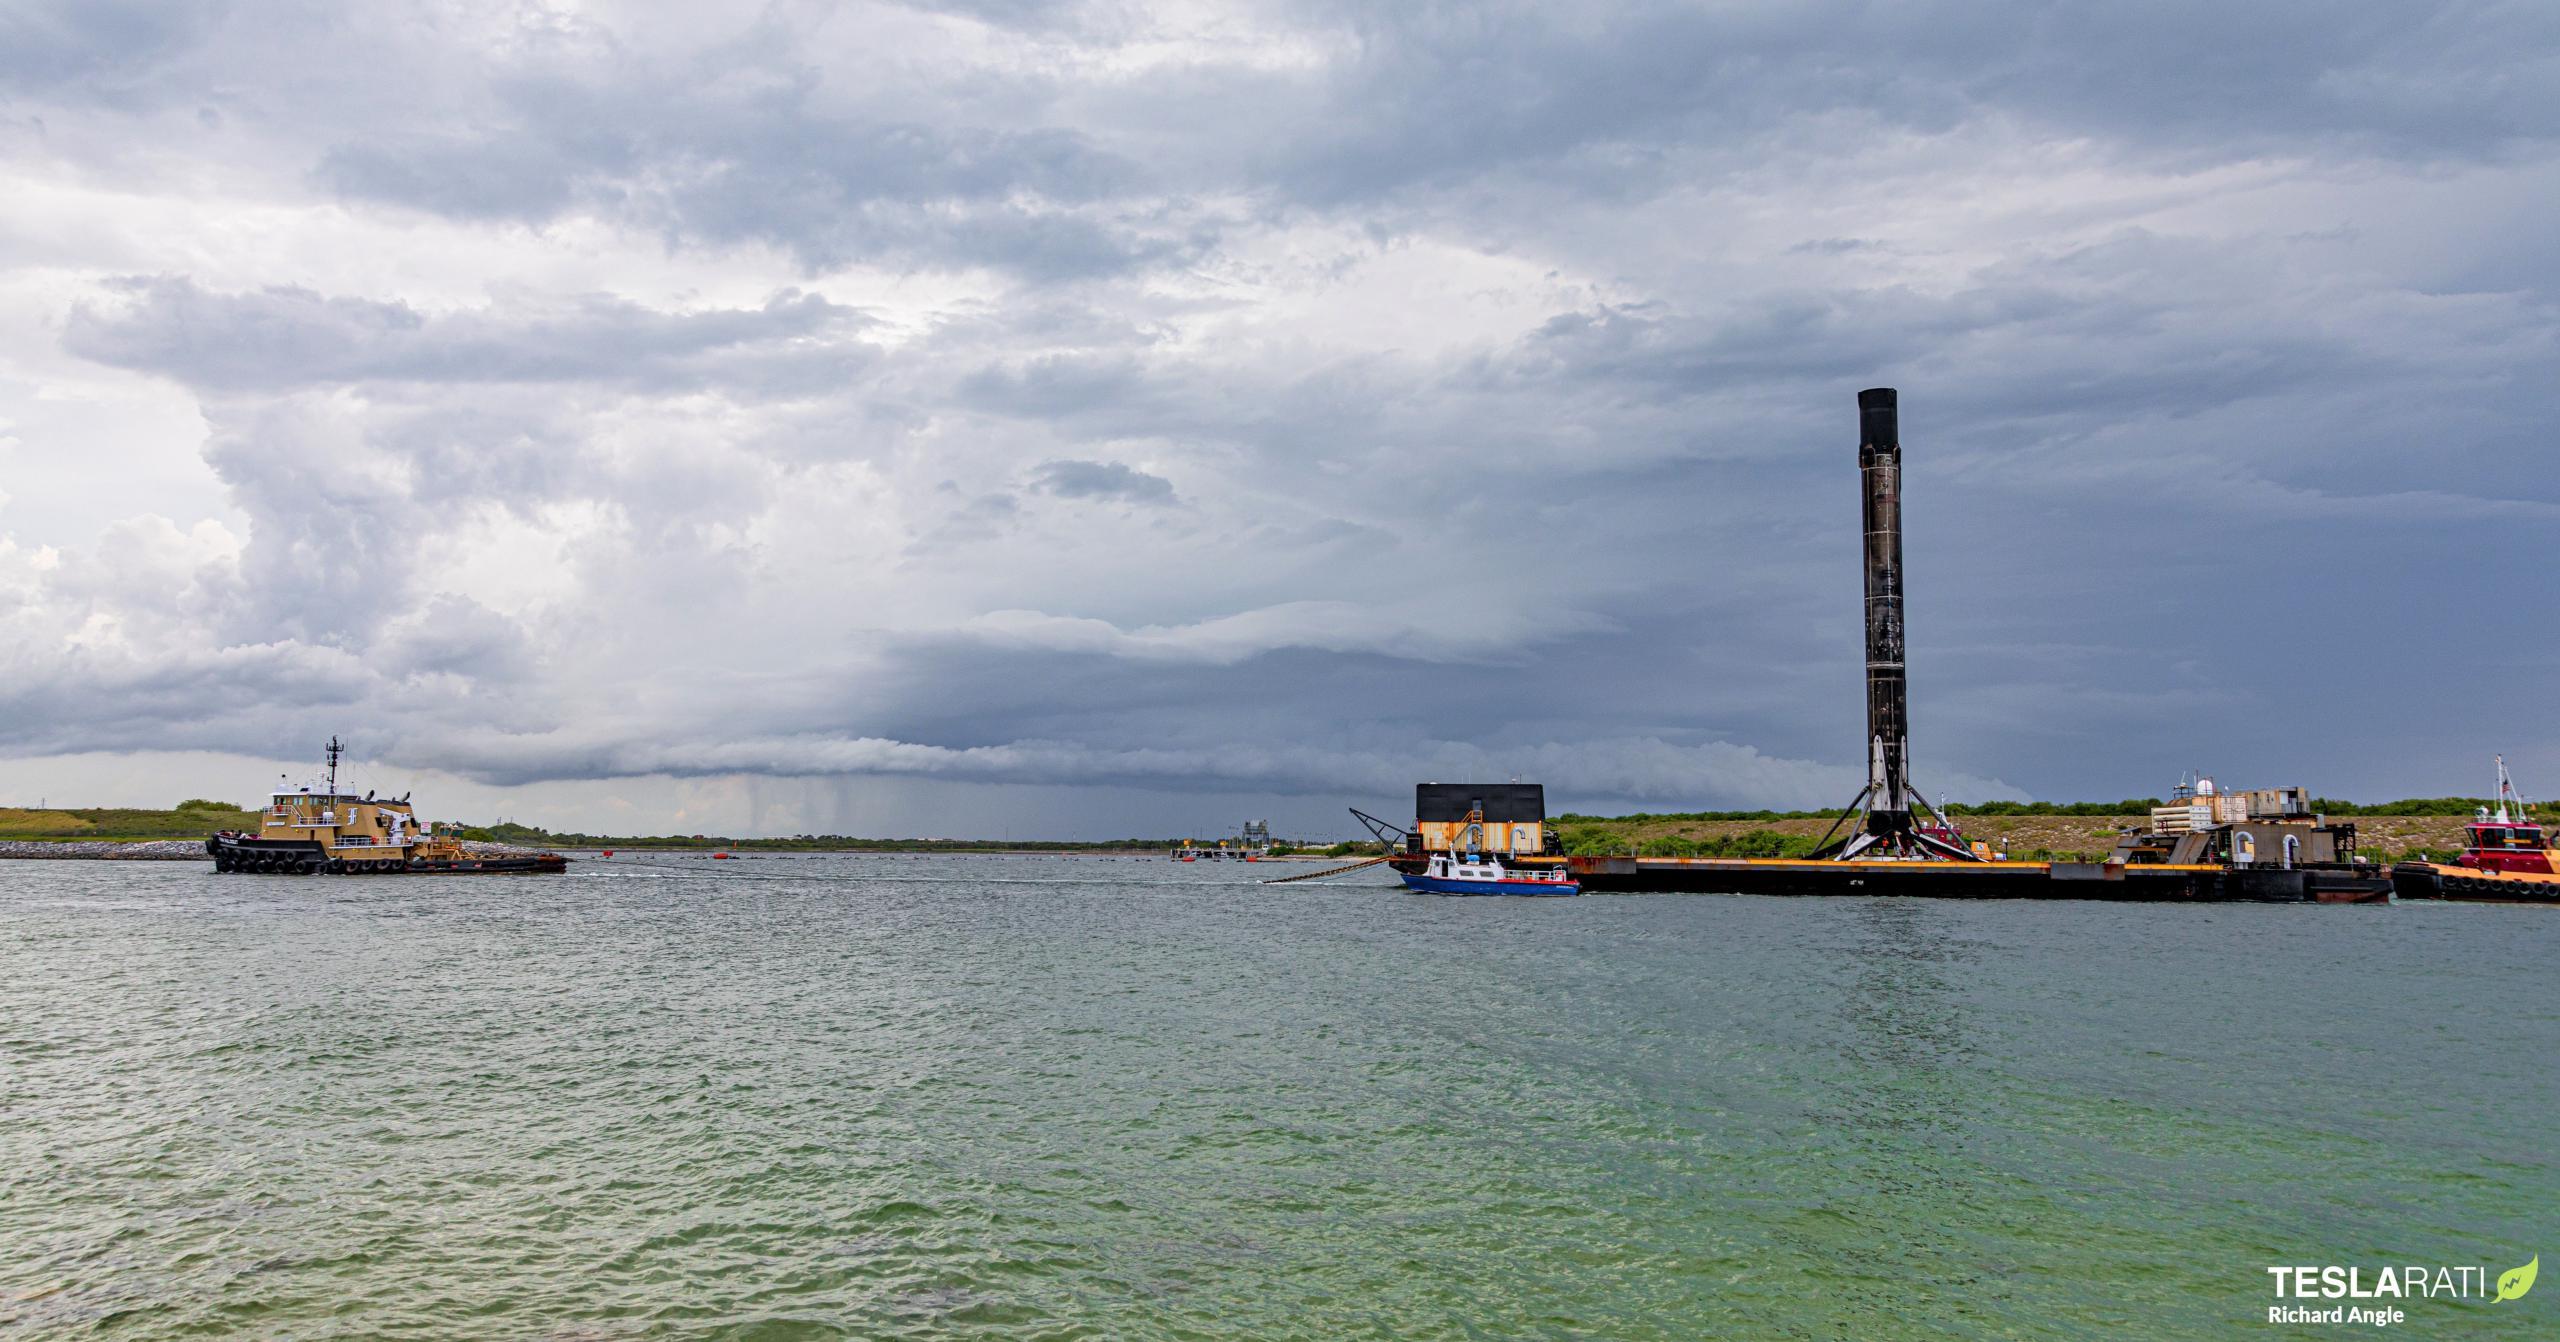 Starlink-27 Falcon 9 B1051 051221 (Richard Angle) port return 3 crop (c)